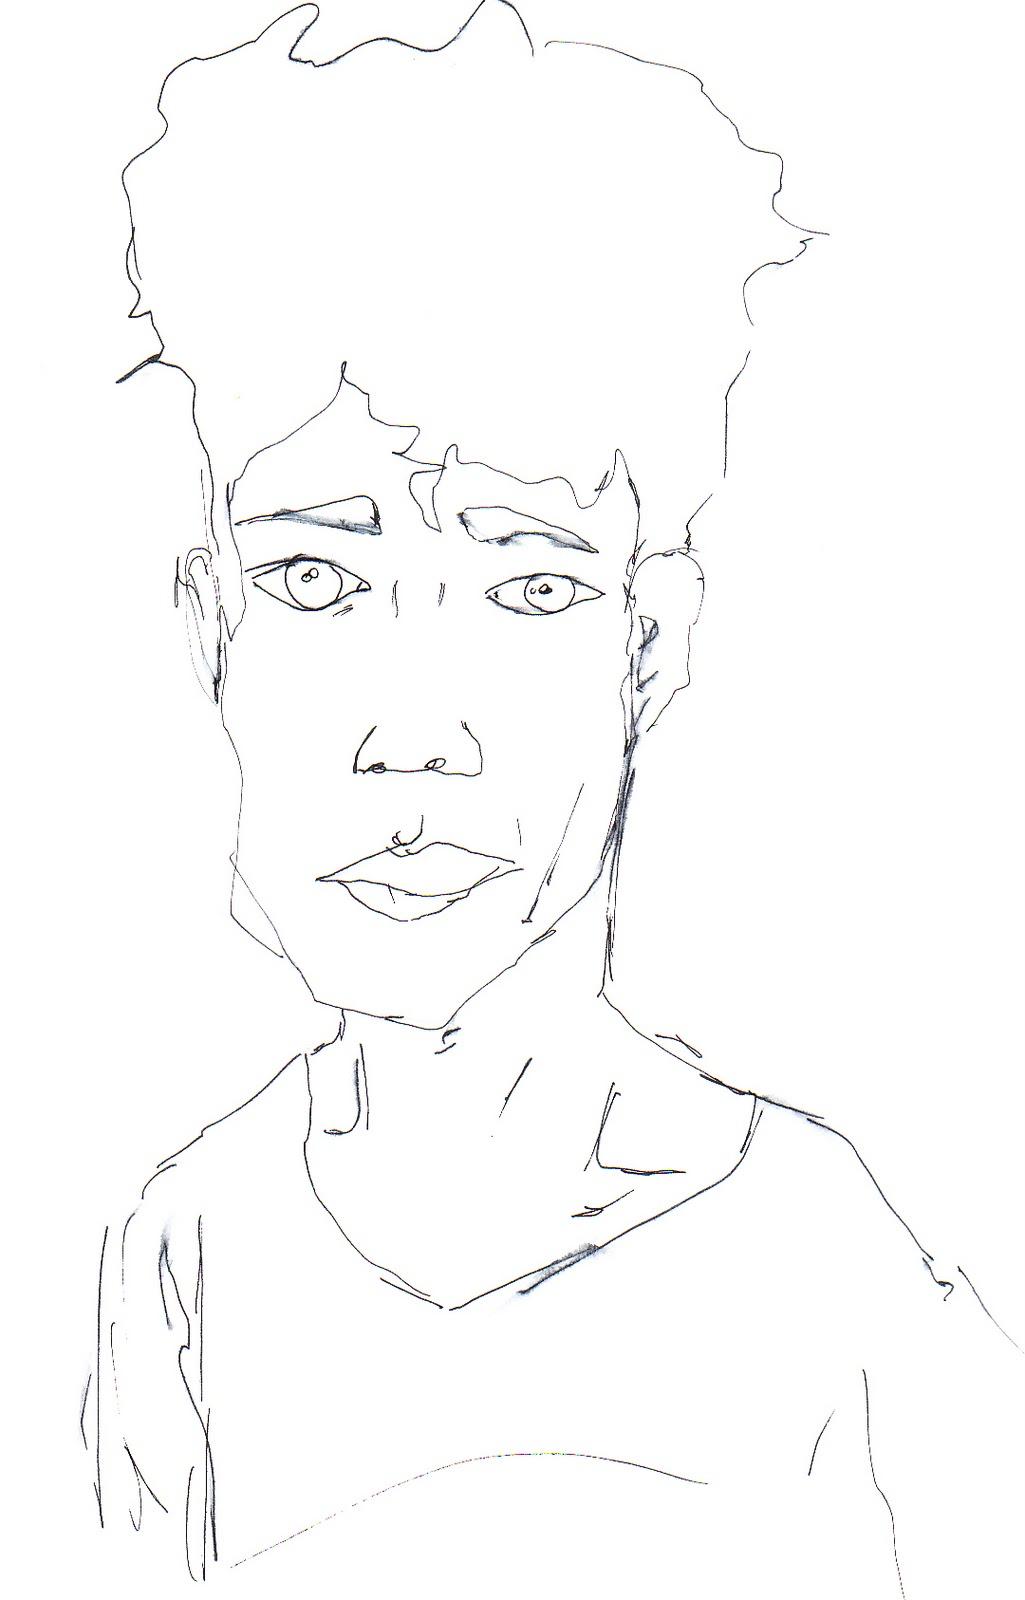 Gabriela-Sanchez-Drawing49.jpg